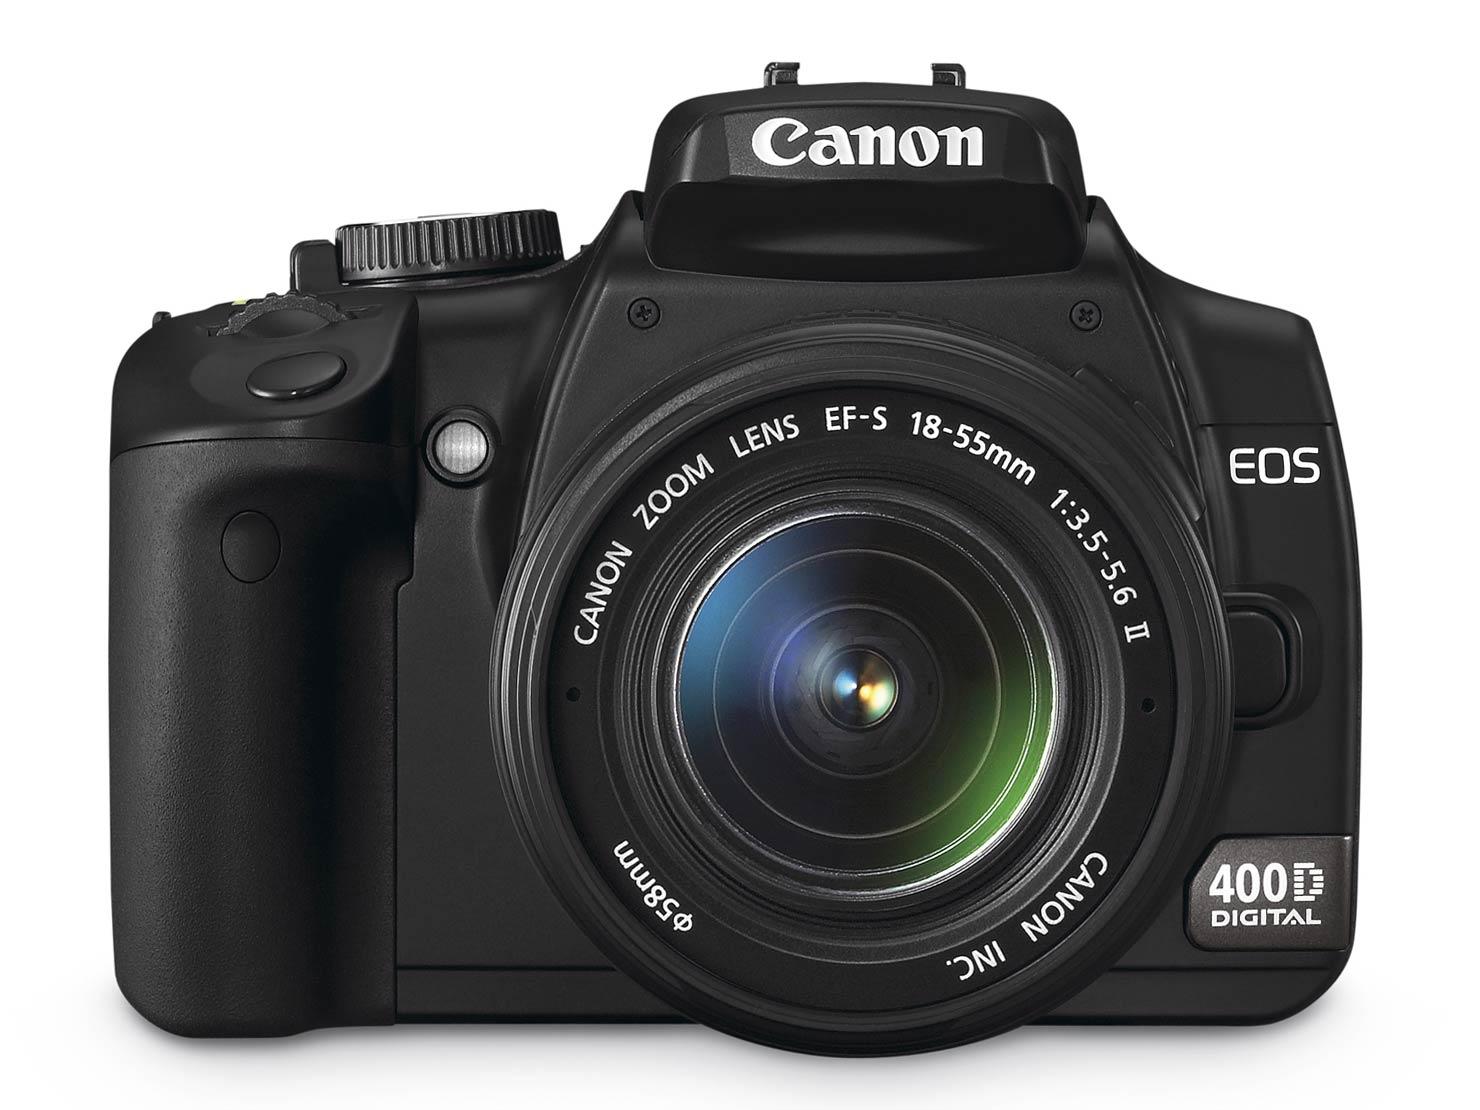 Zoomlens : Tamron 18-250mm f/3,5-6.3